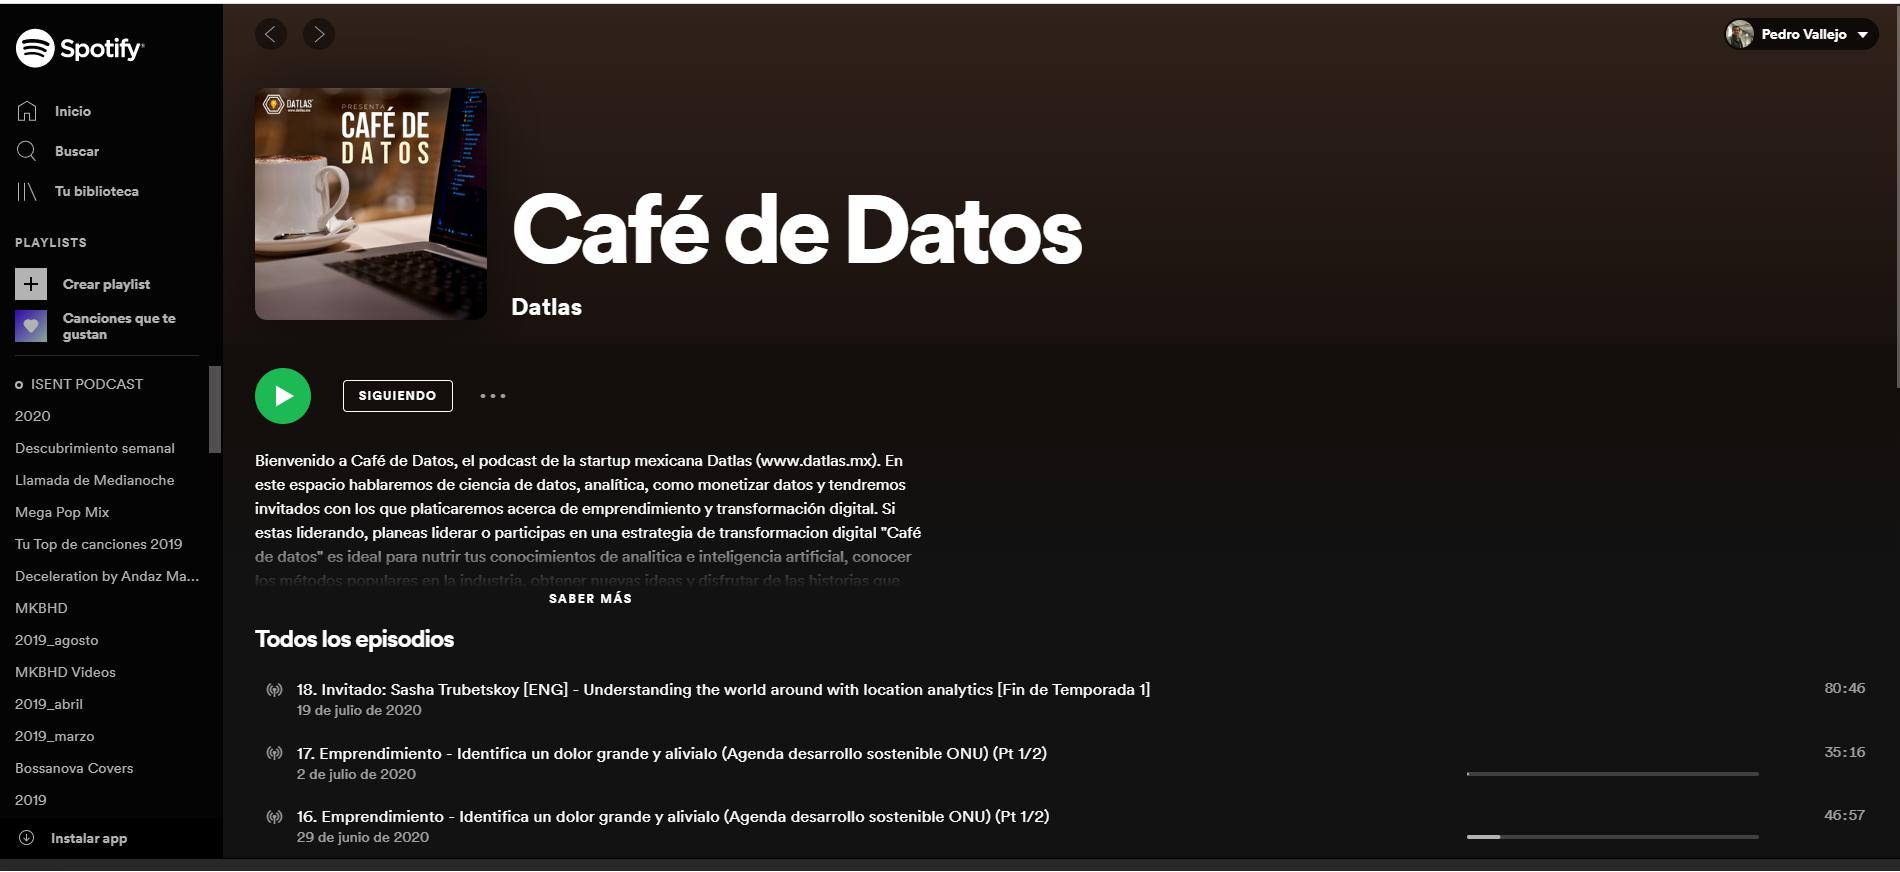 Datlas_CafeDeDatos_1eraTemporada